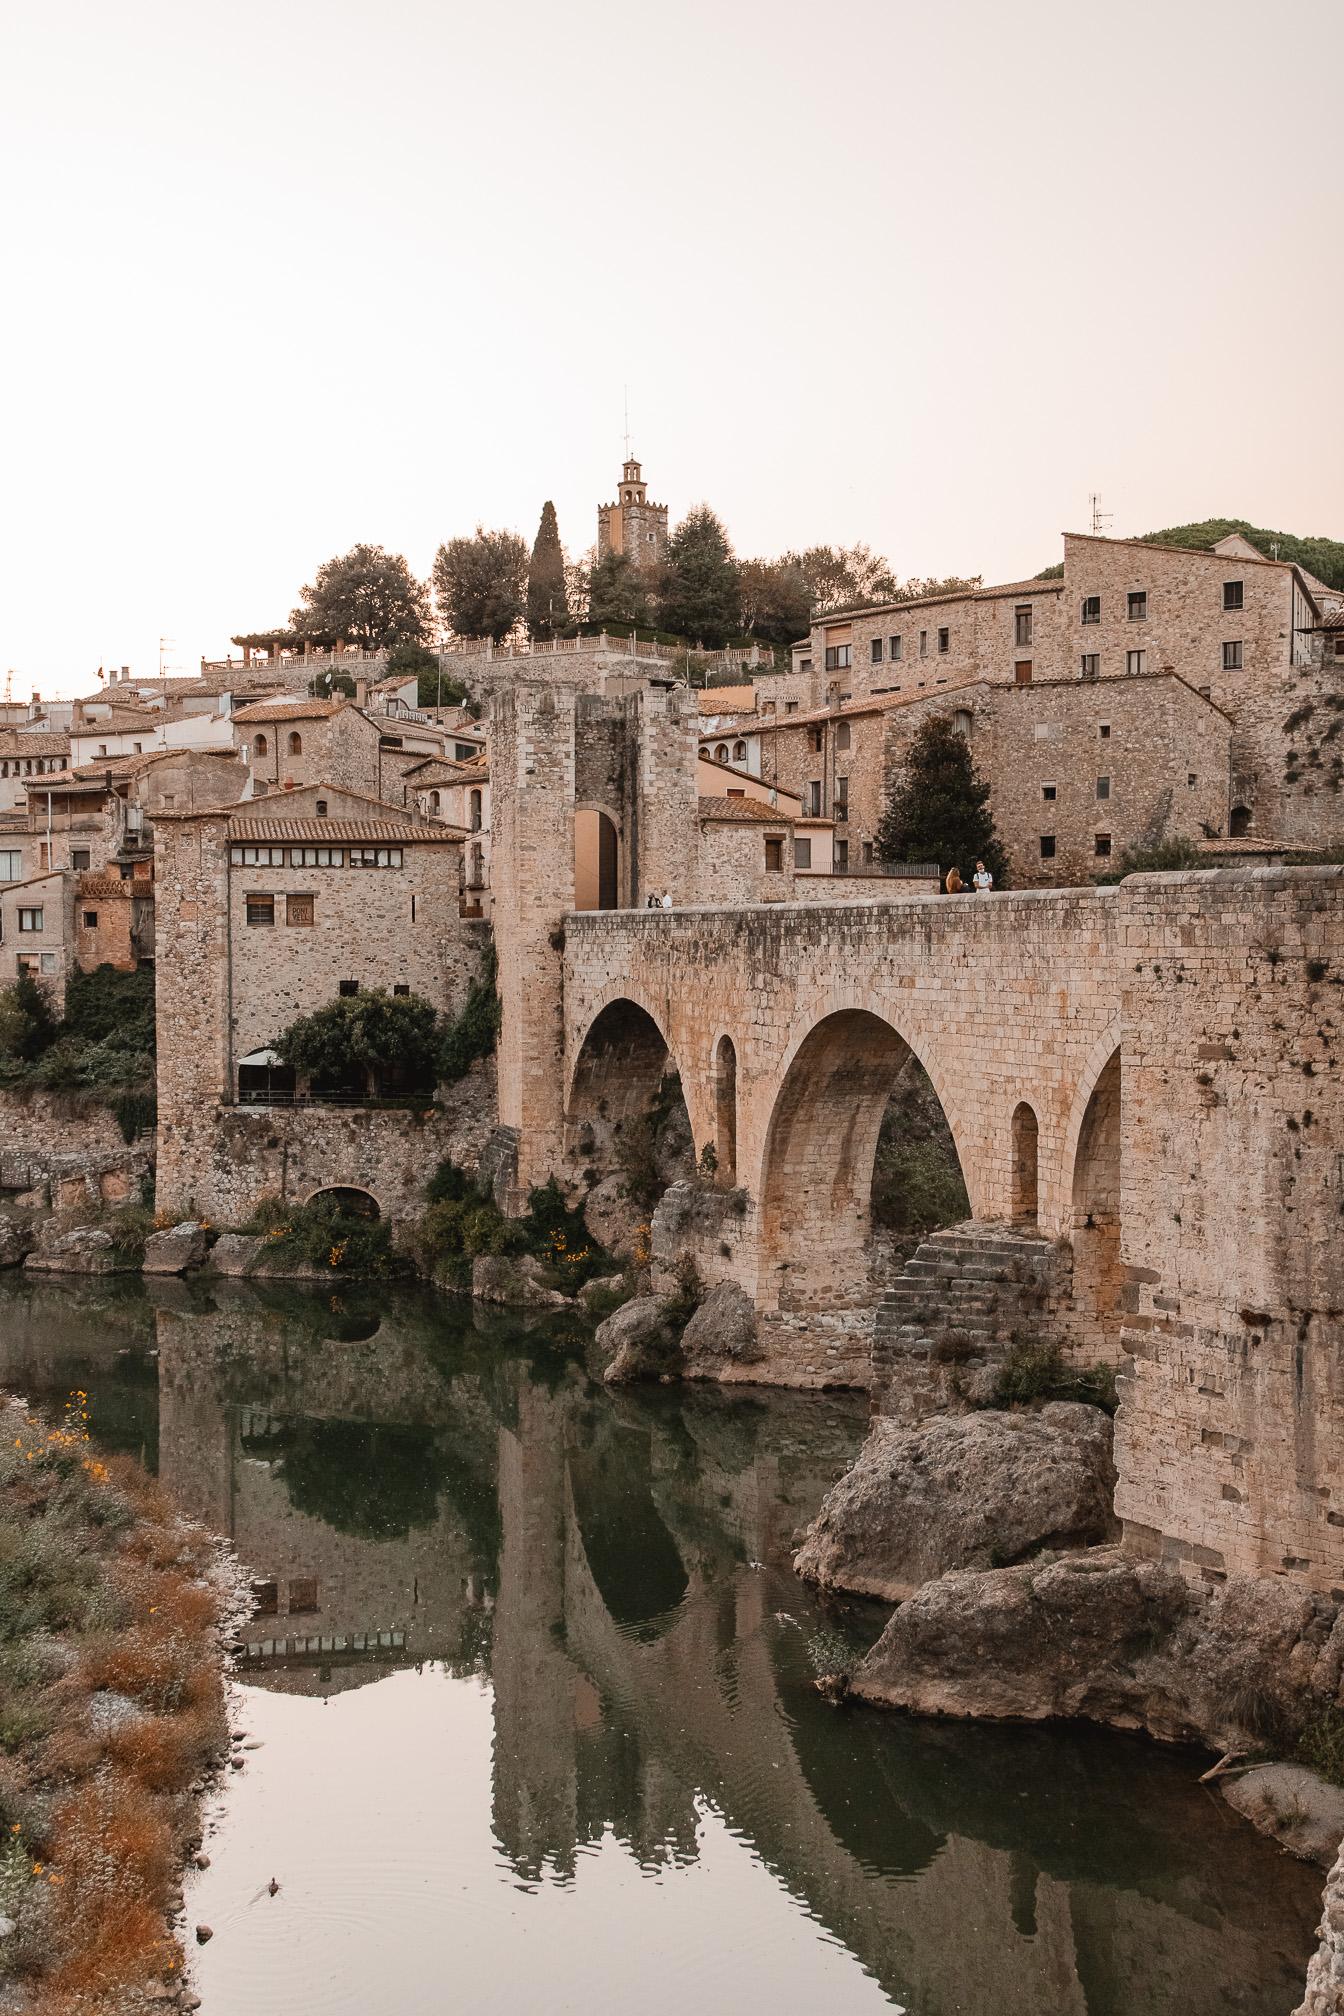 basalu pueblo medieval ruta invitada perfeca